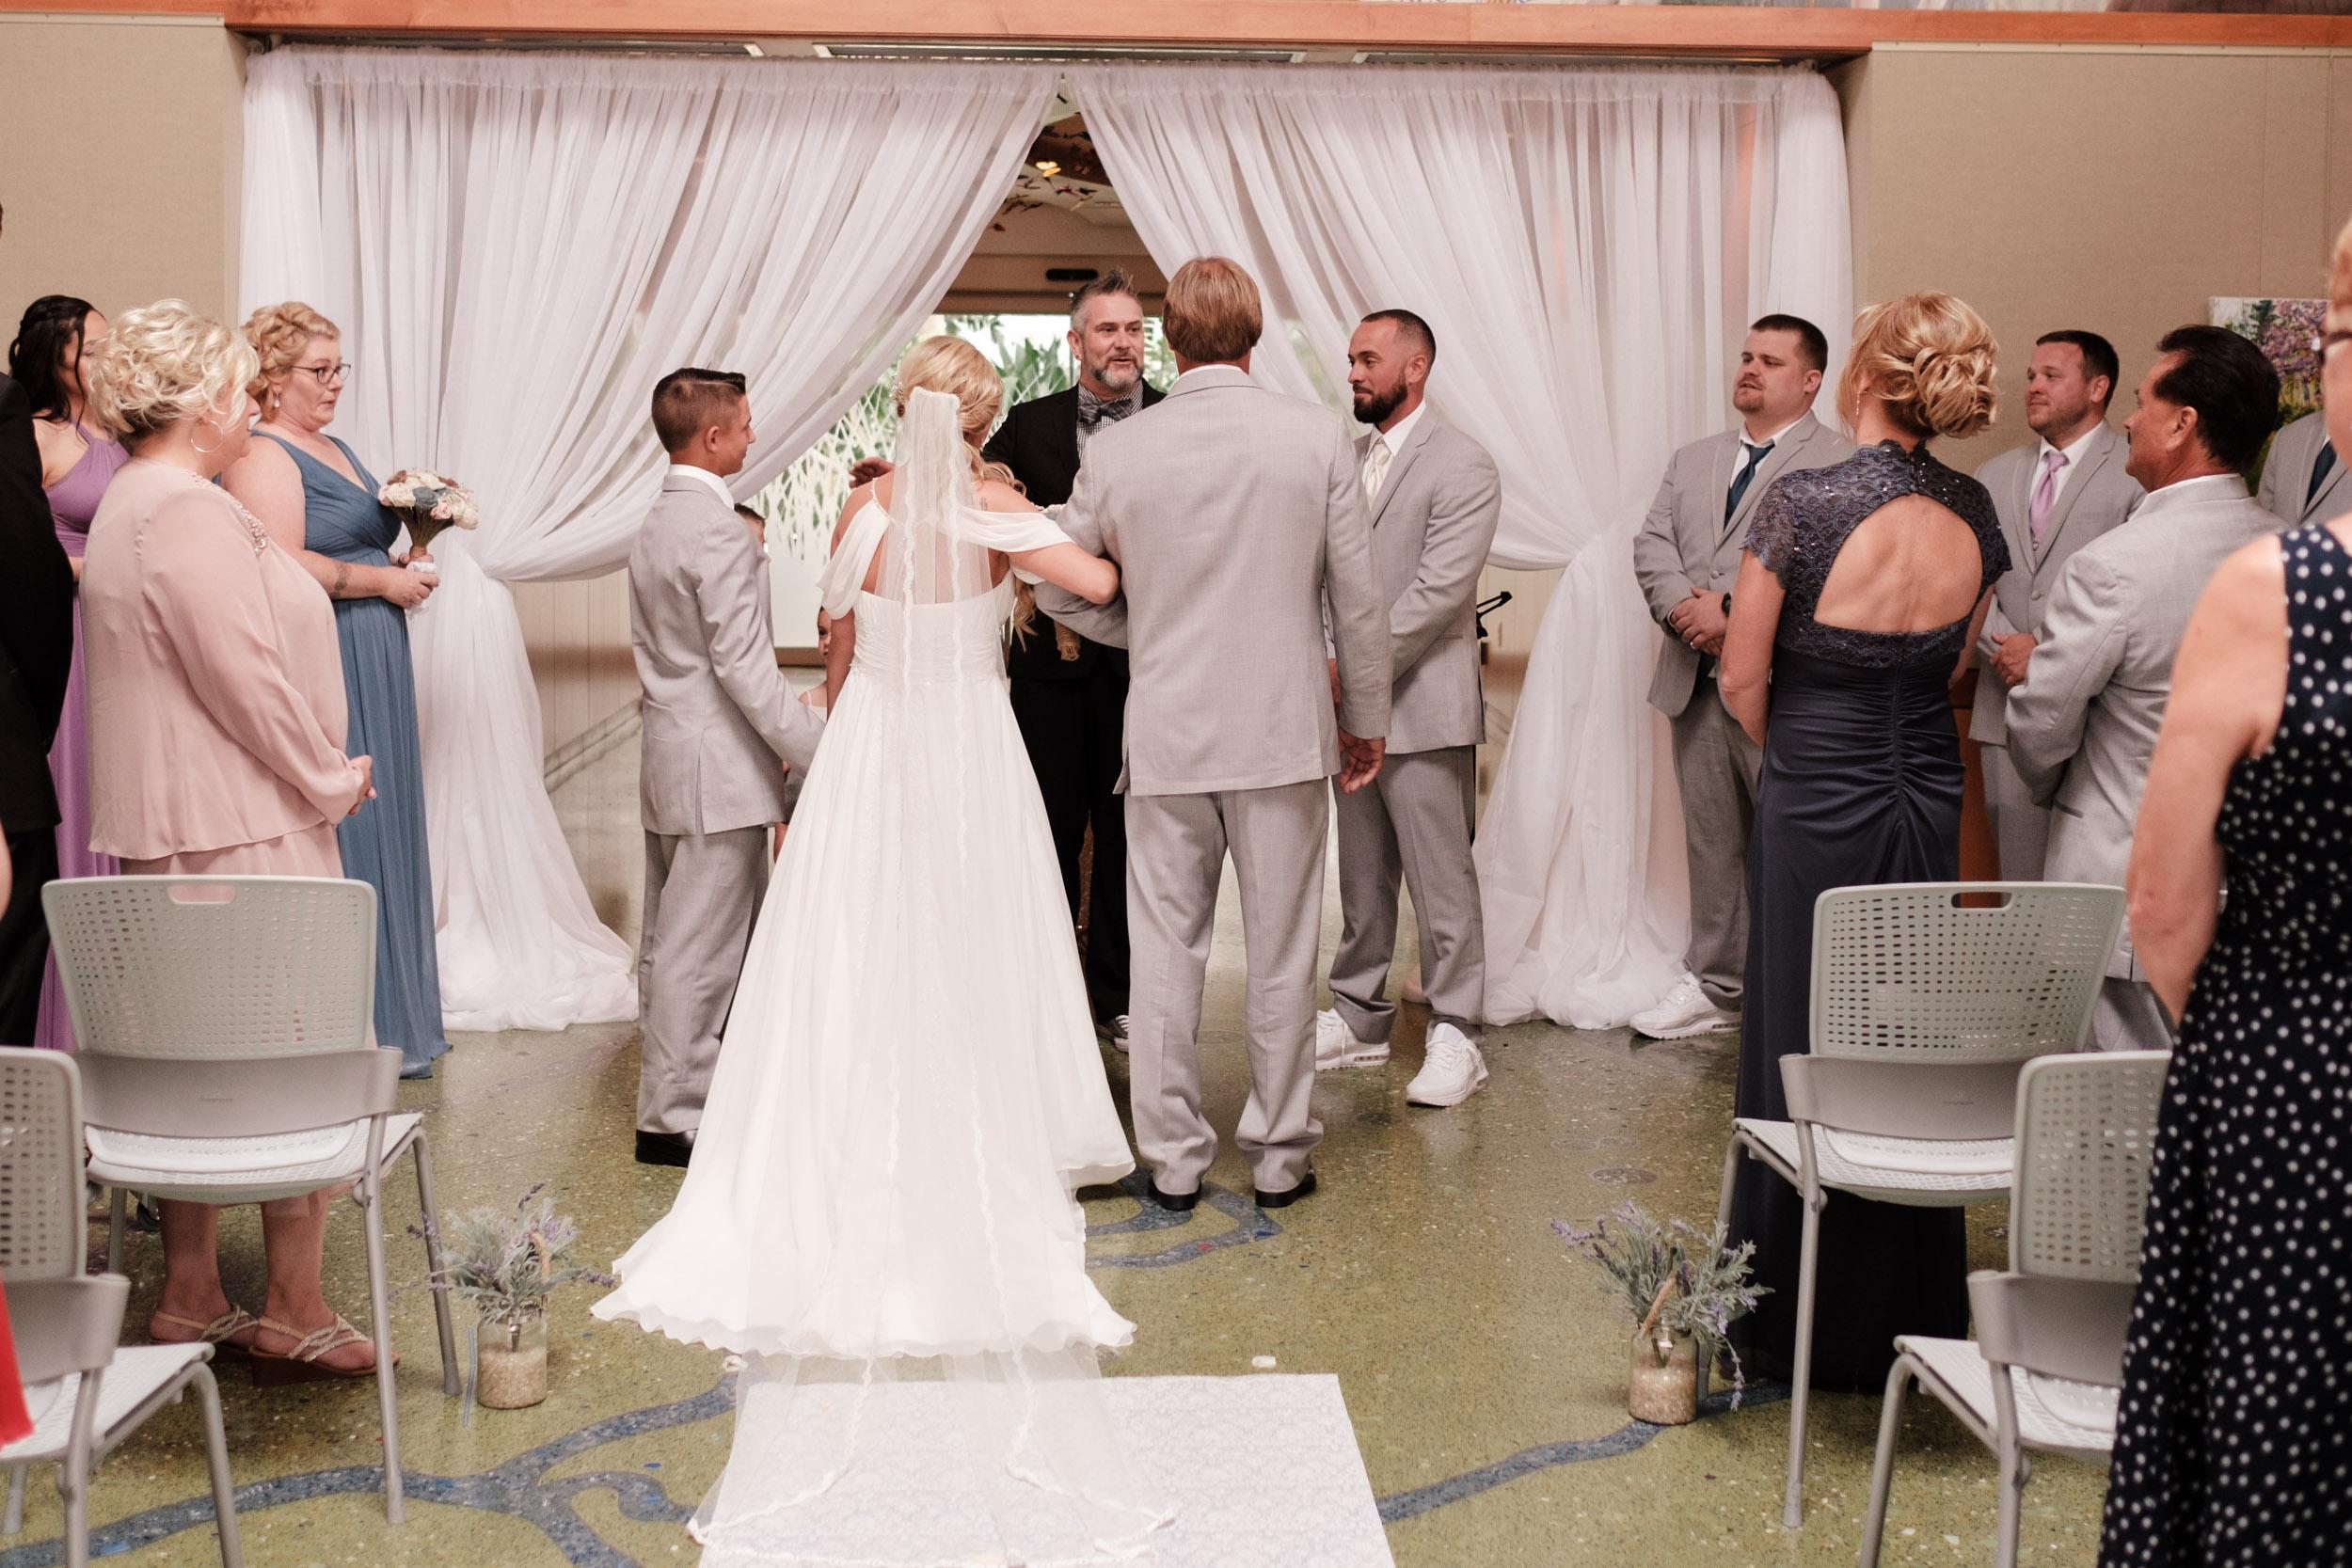 19-06-01 Megan Josh - Nicholas Conservatory Wedding-10.jpg